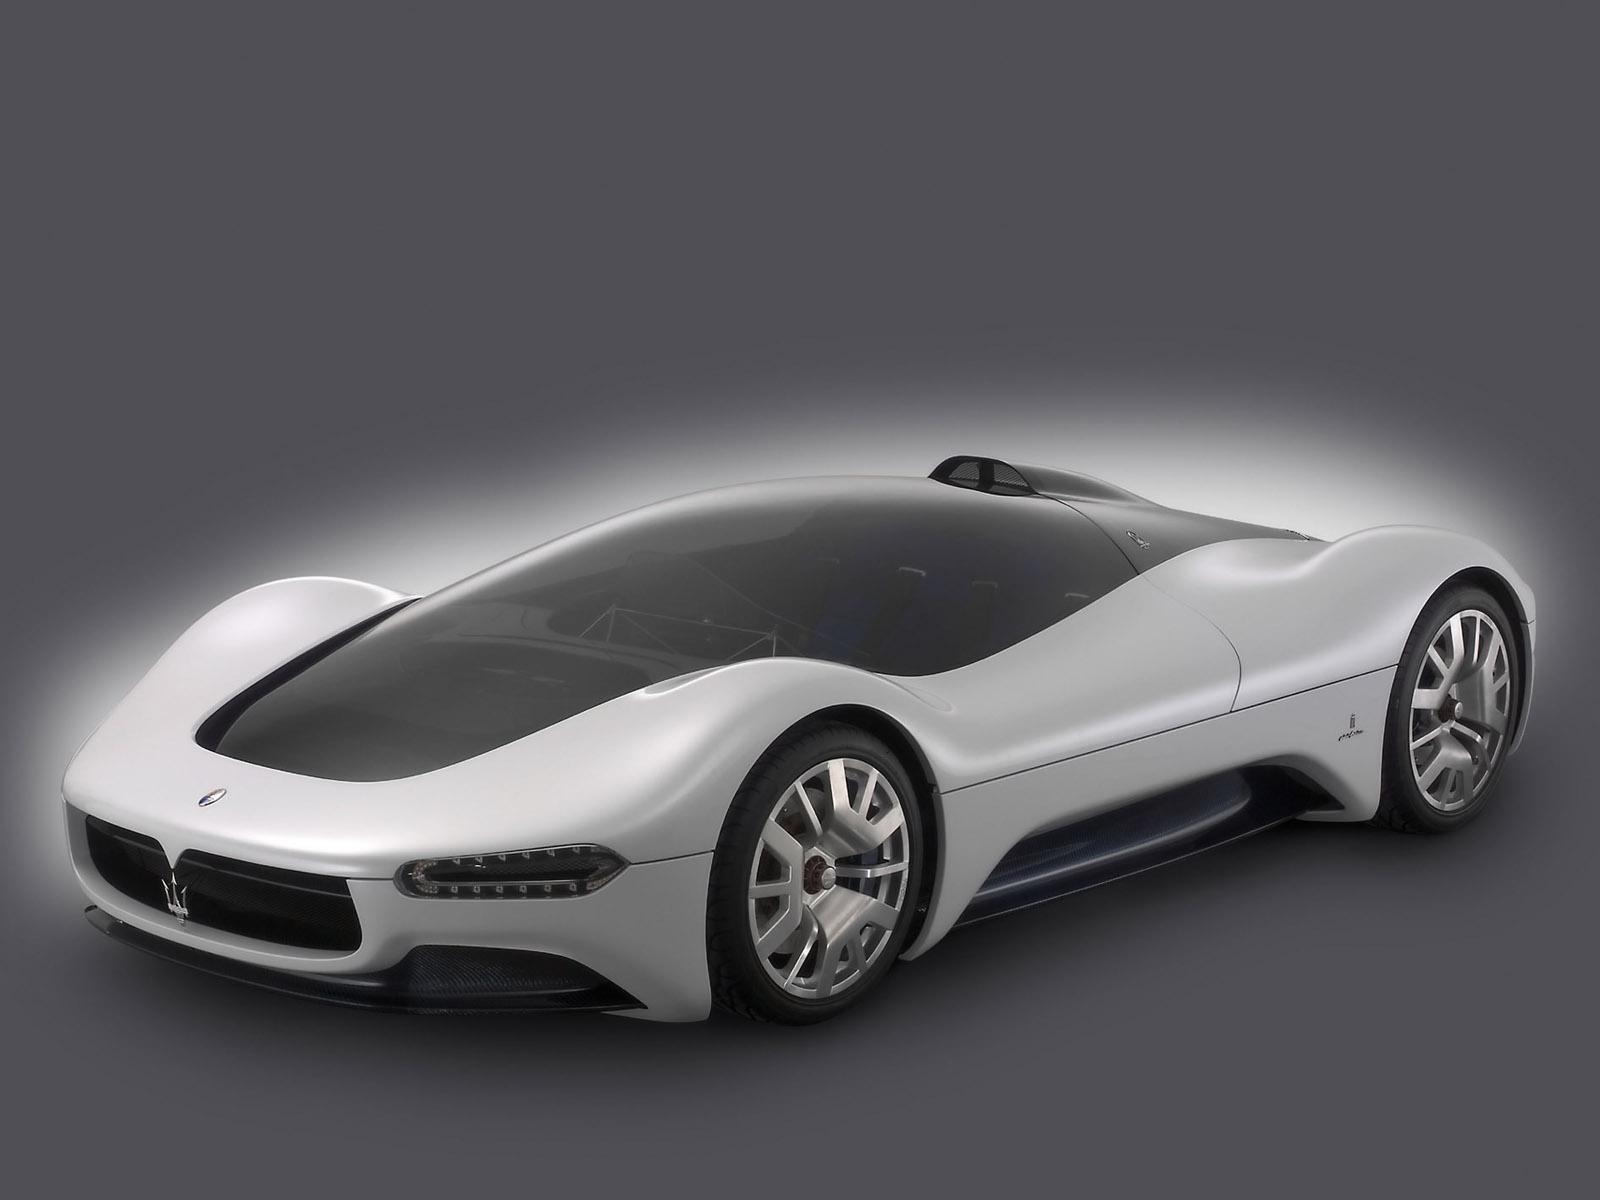 fast concept supercars. Black Bedroom Furniture Sets. Home Design Ideas